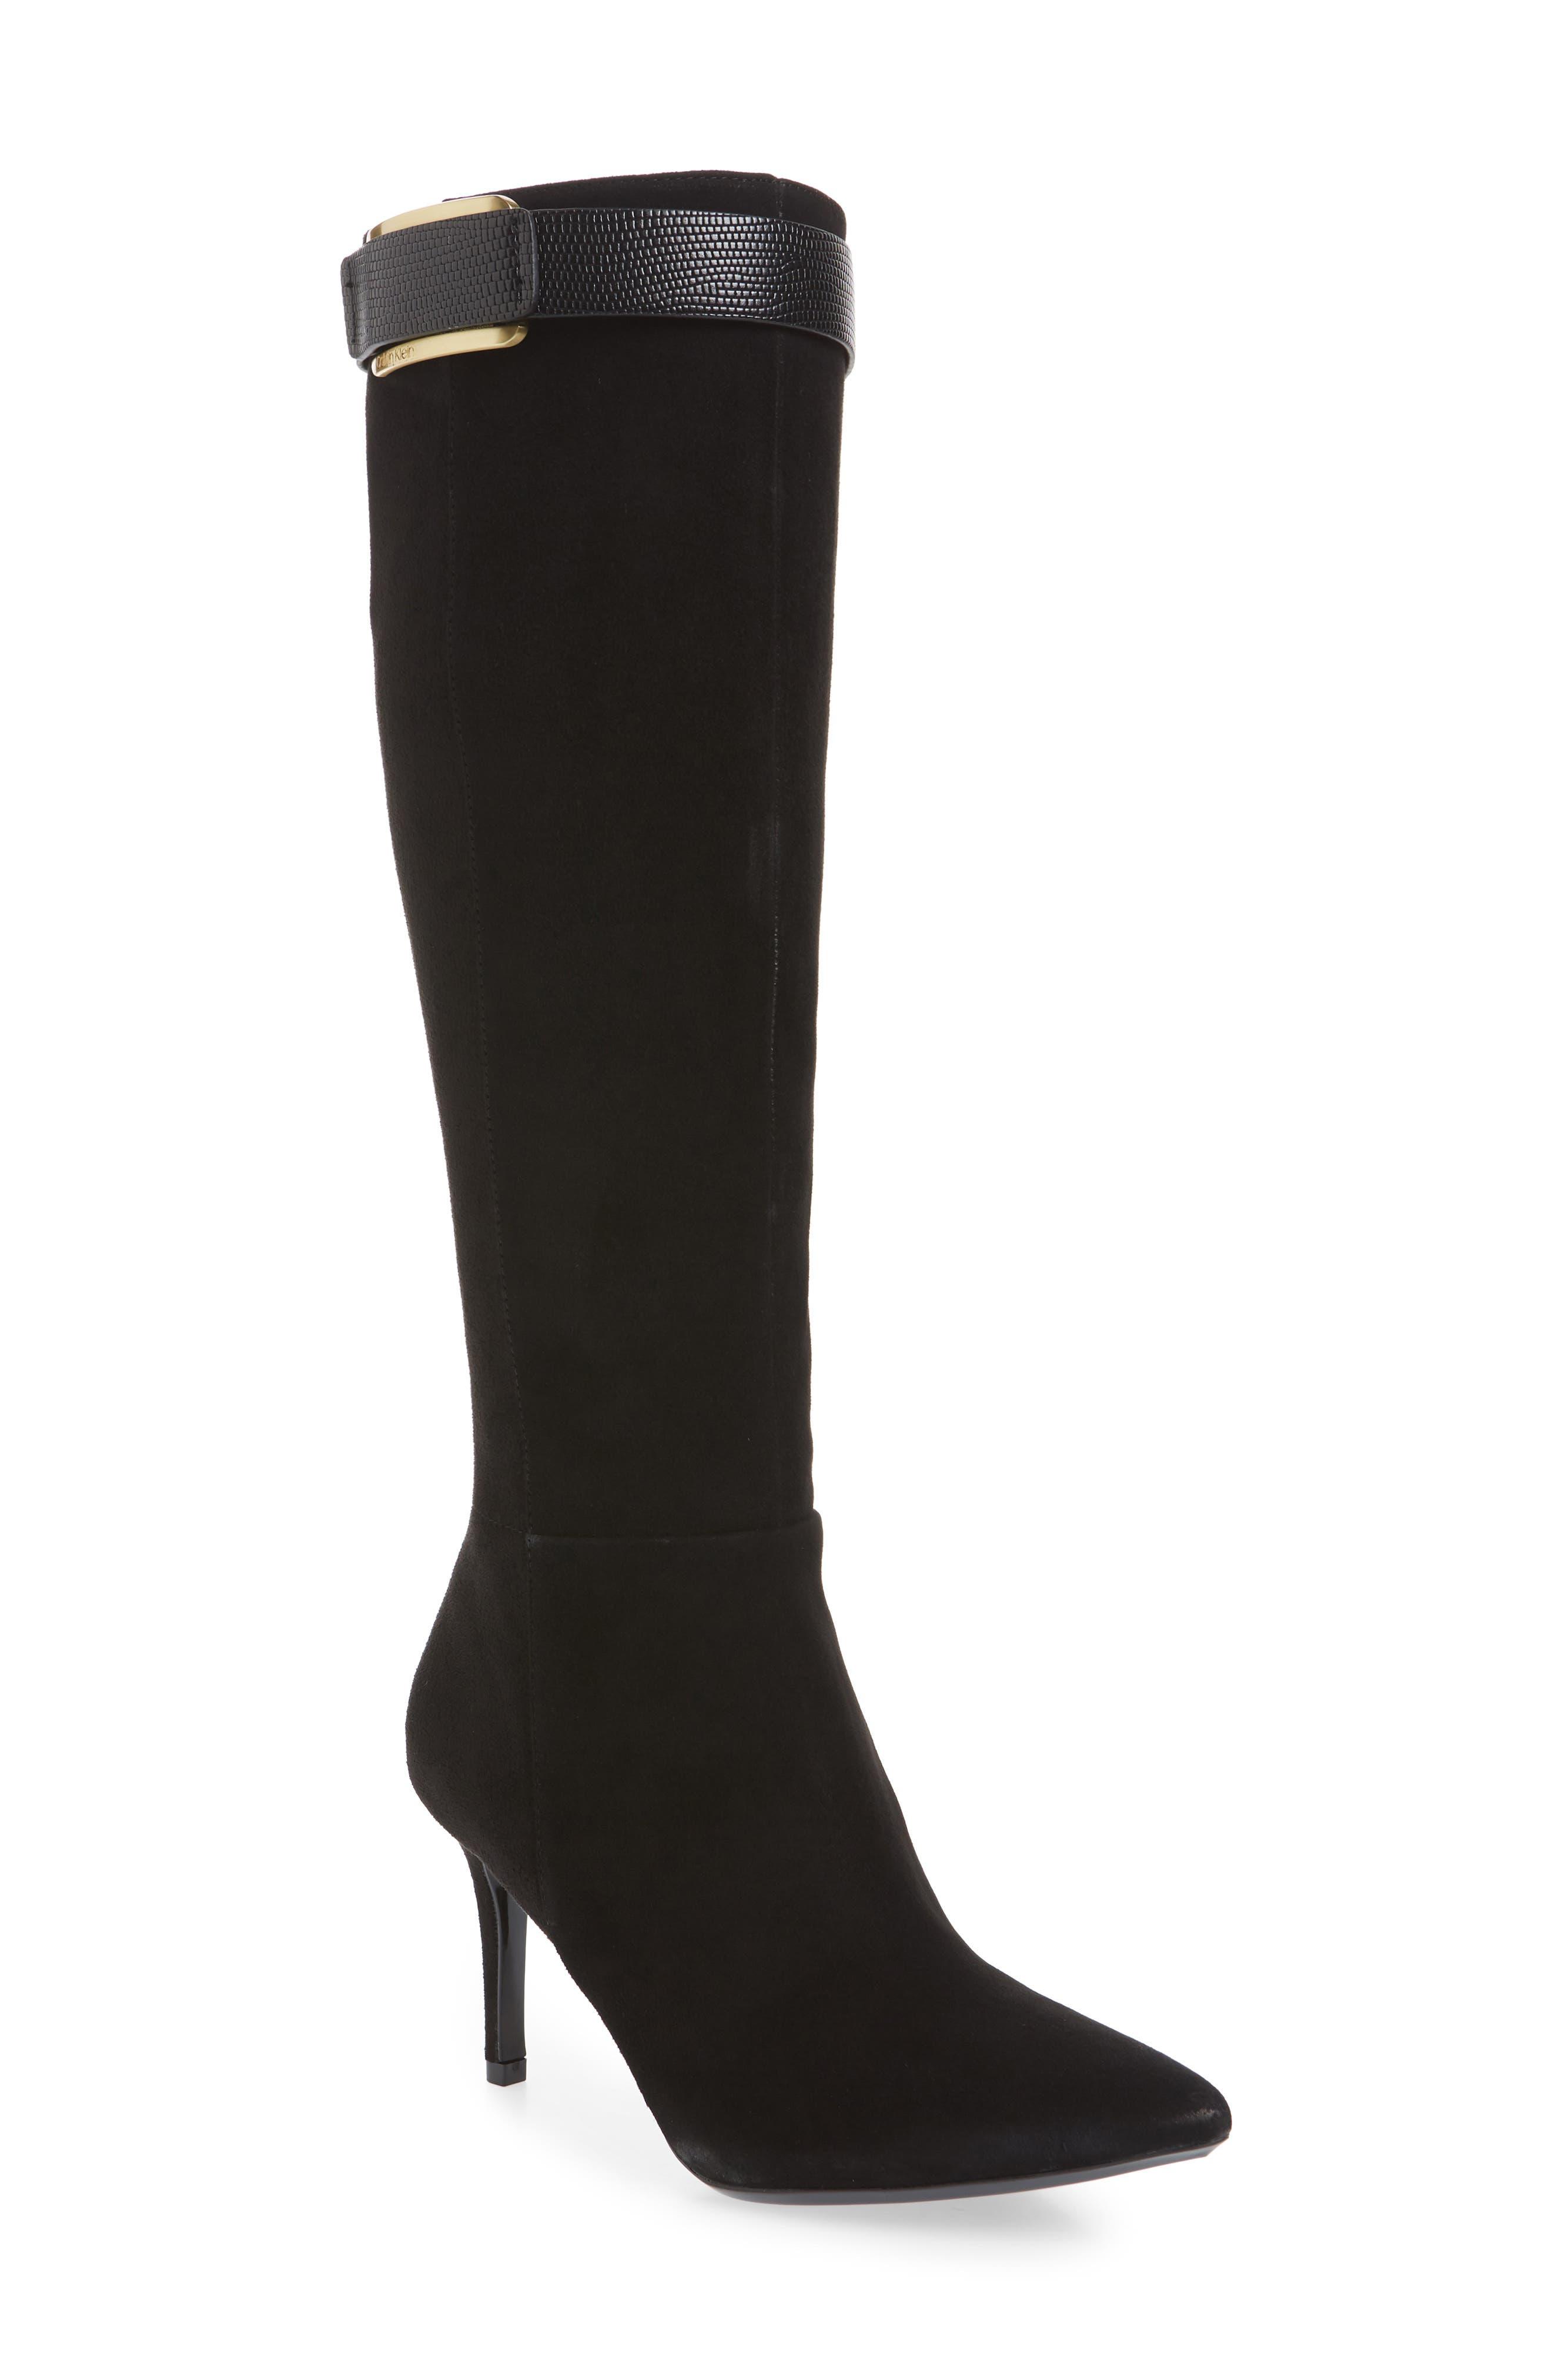 CALVIN KLEIN Glydia Stiletto Knee High Boot in Black Nappa